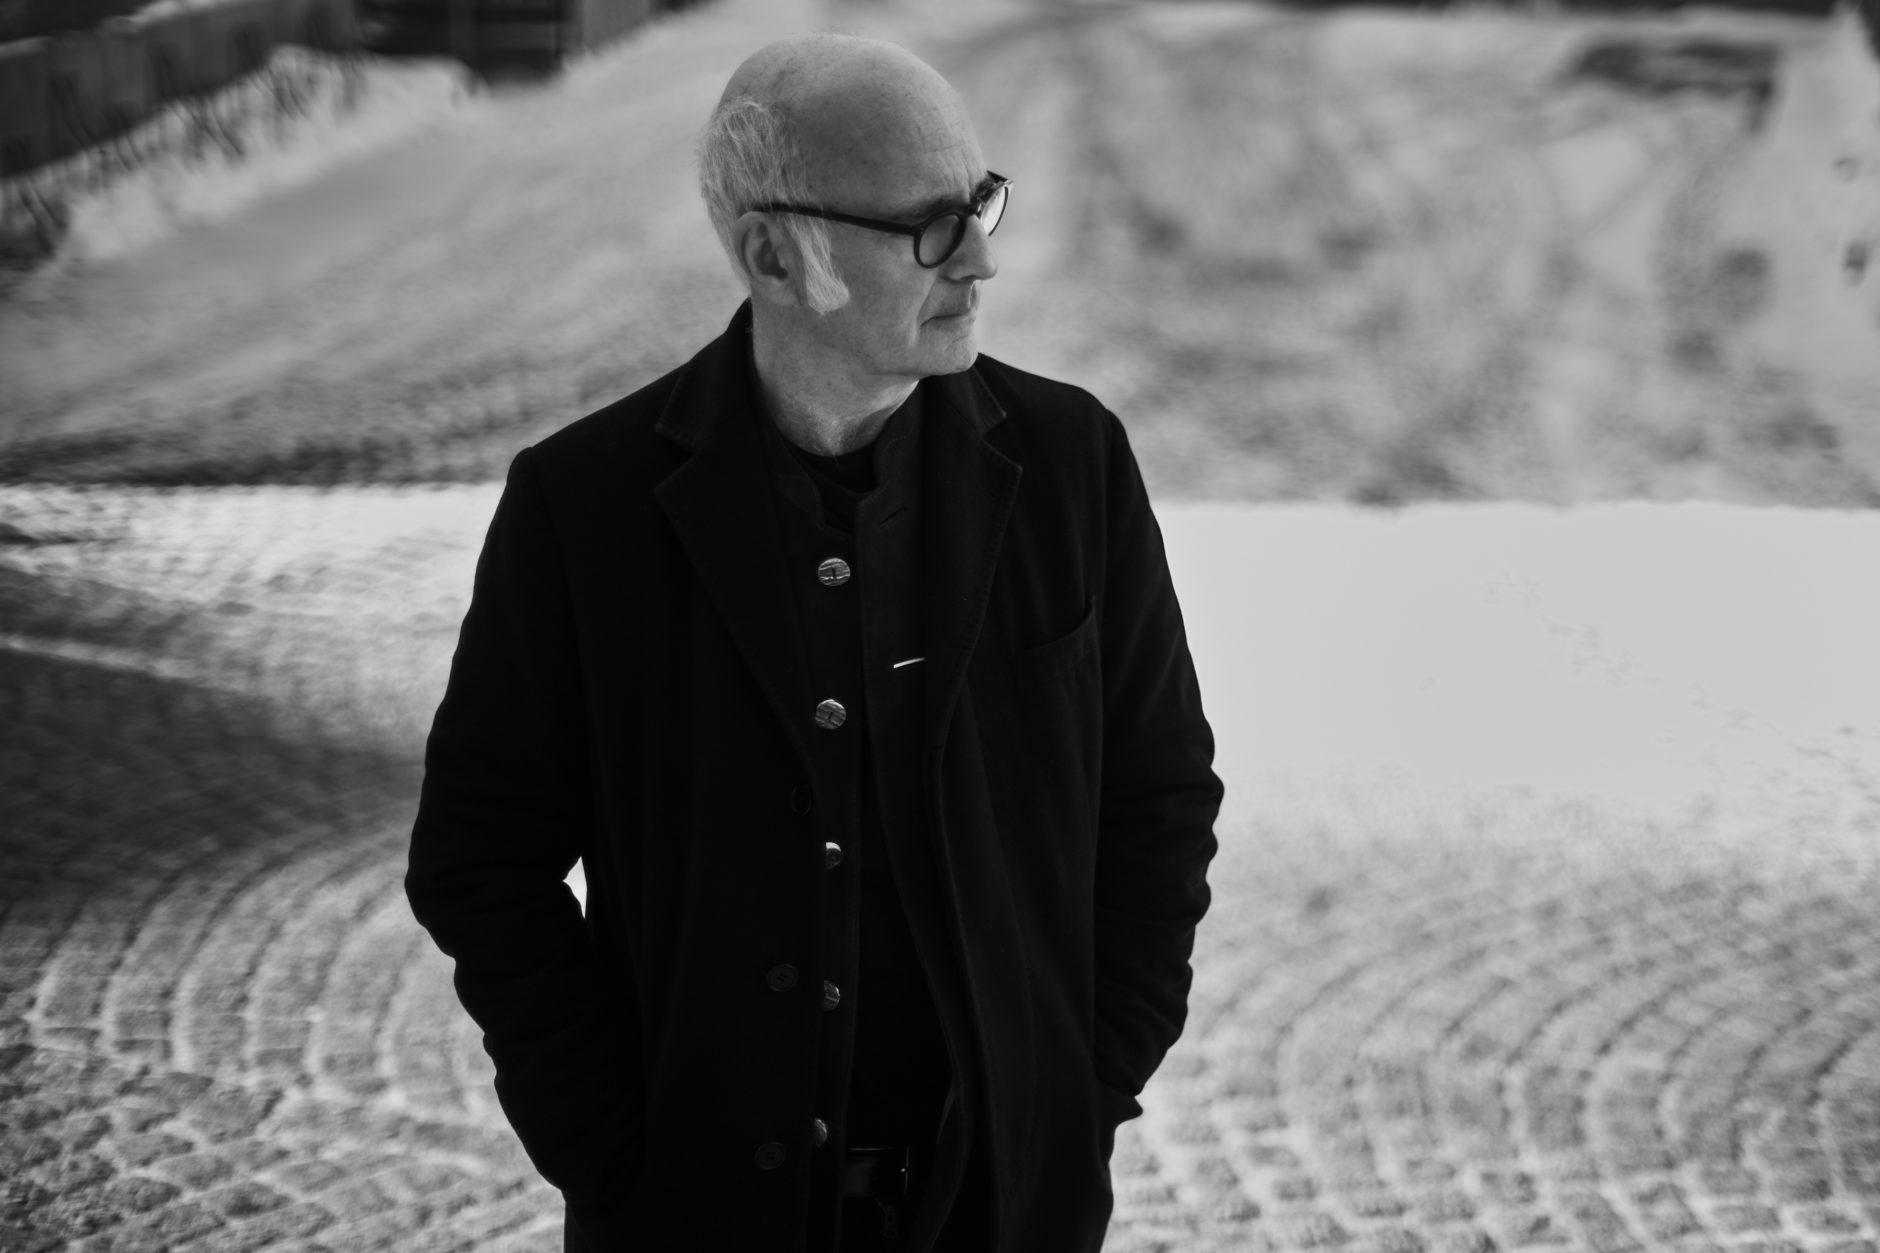 Ludovico Einaudi – Seven days walking 2